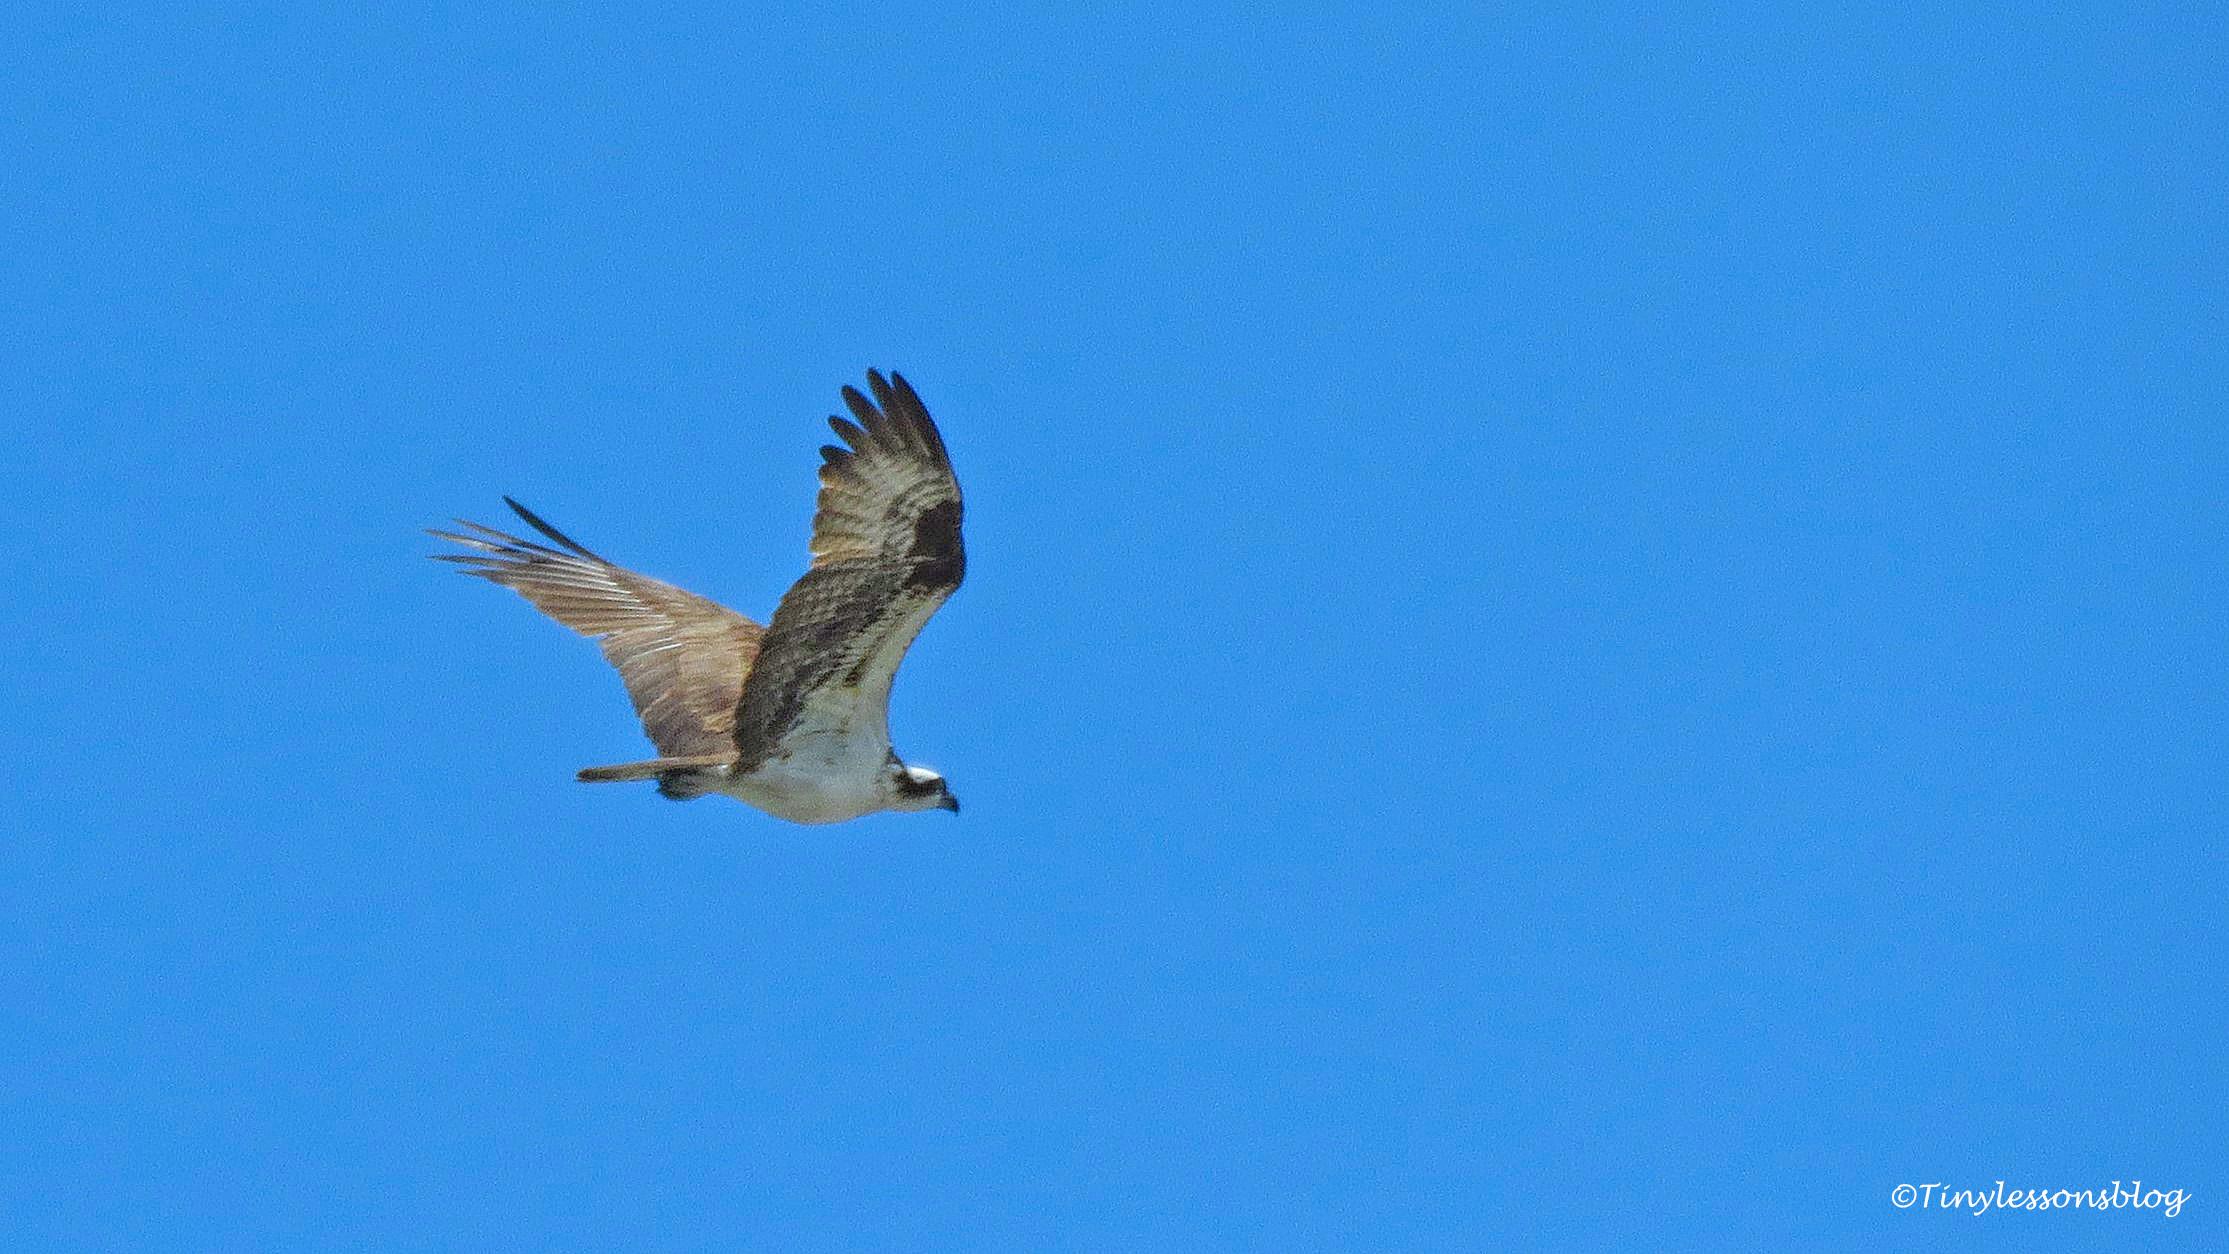 Mama Osprey chased an intruder ud161